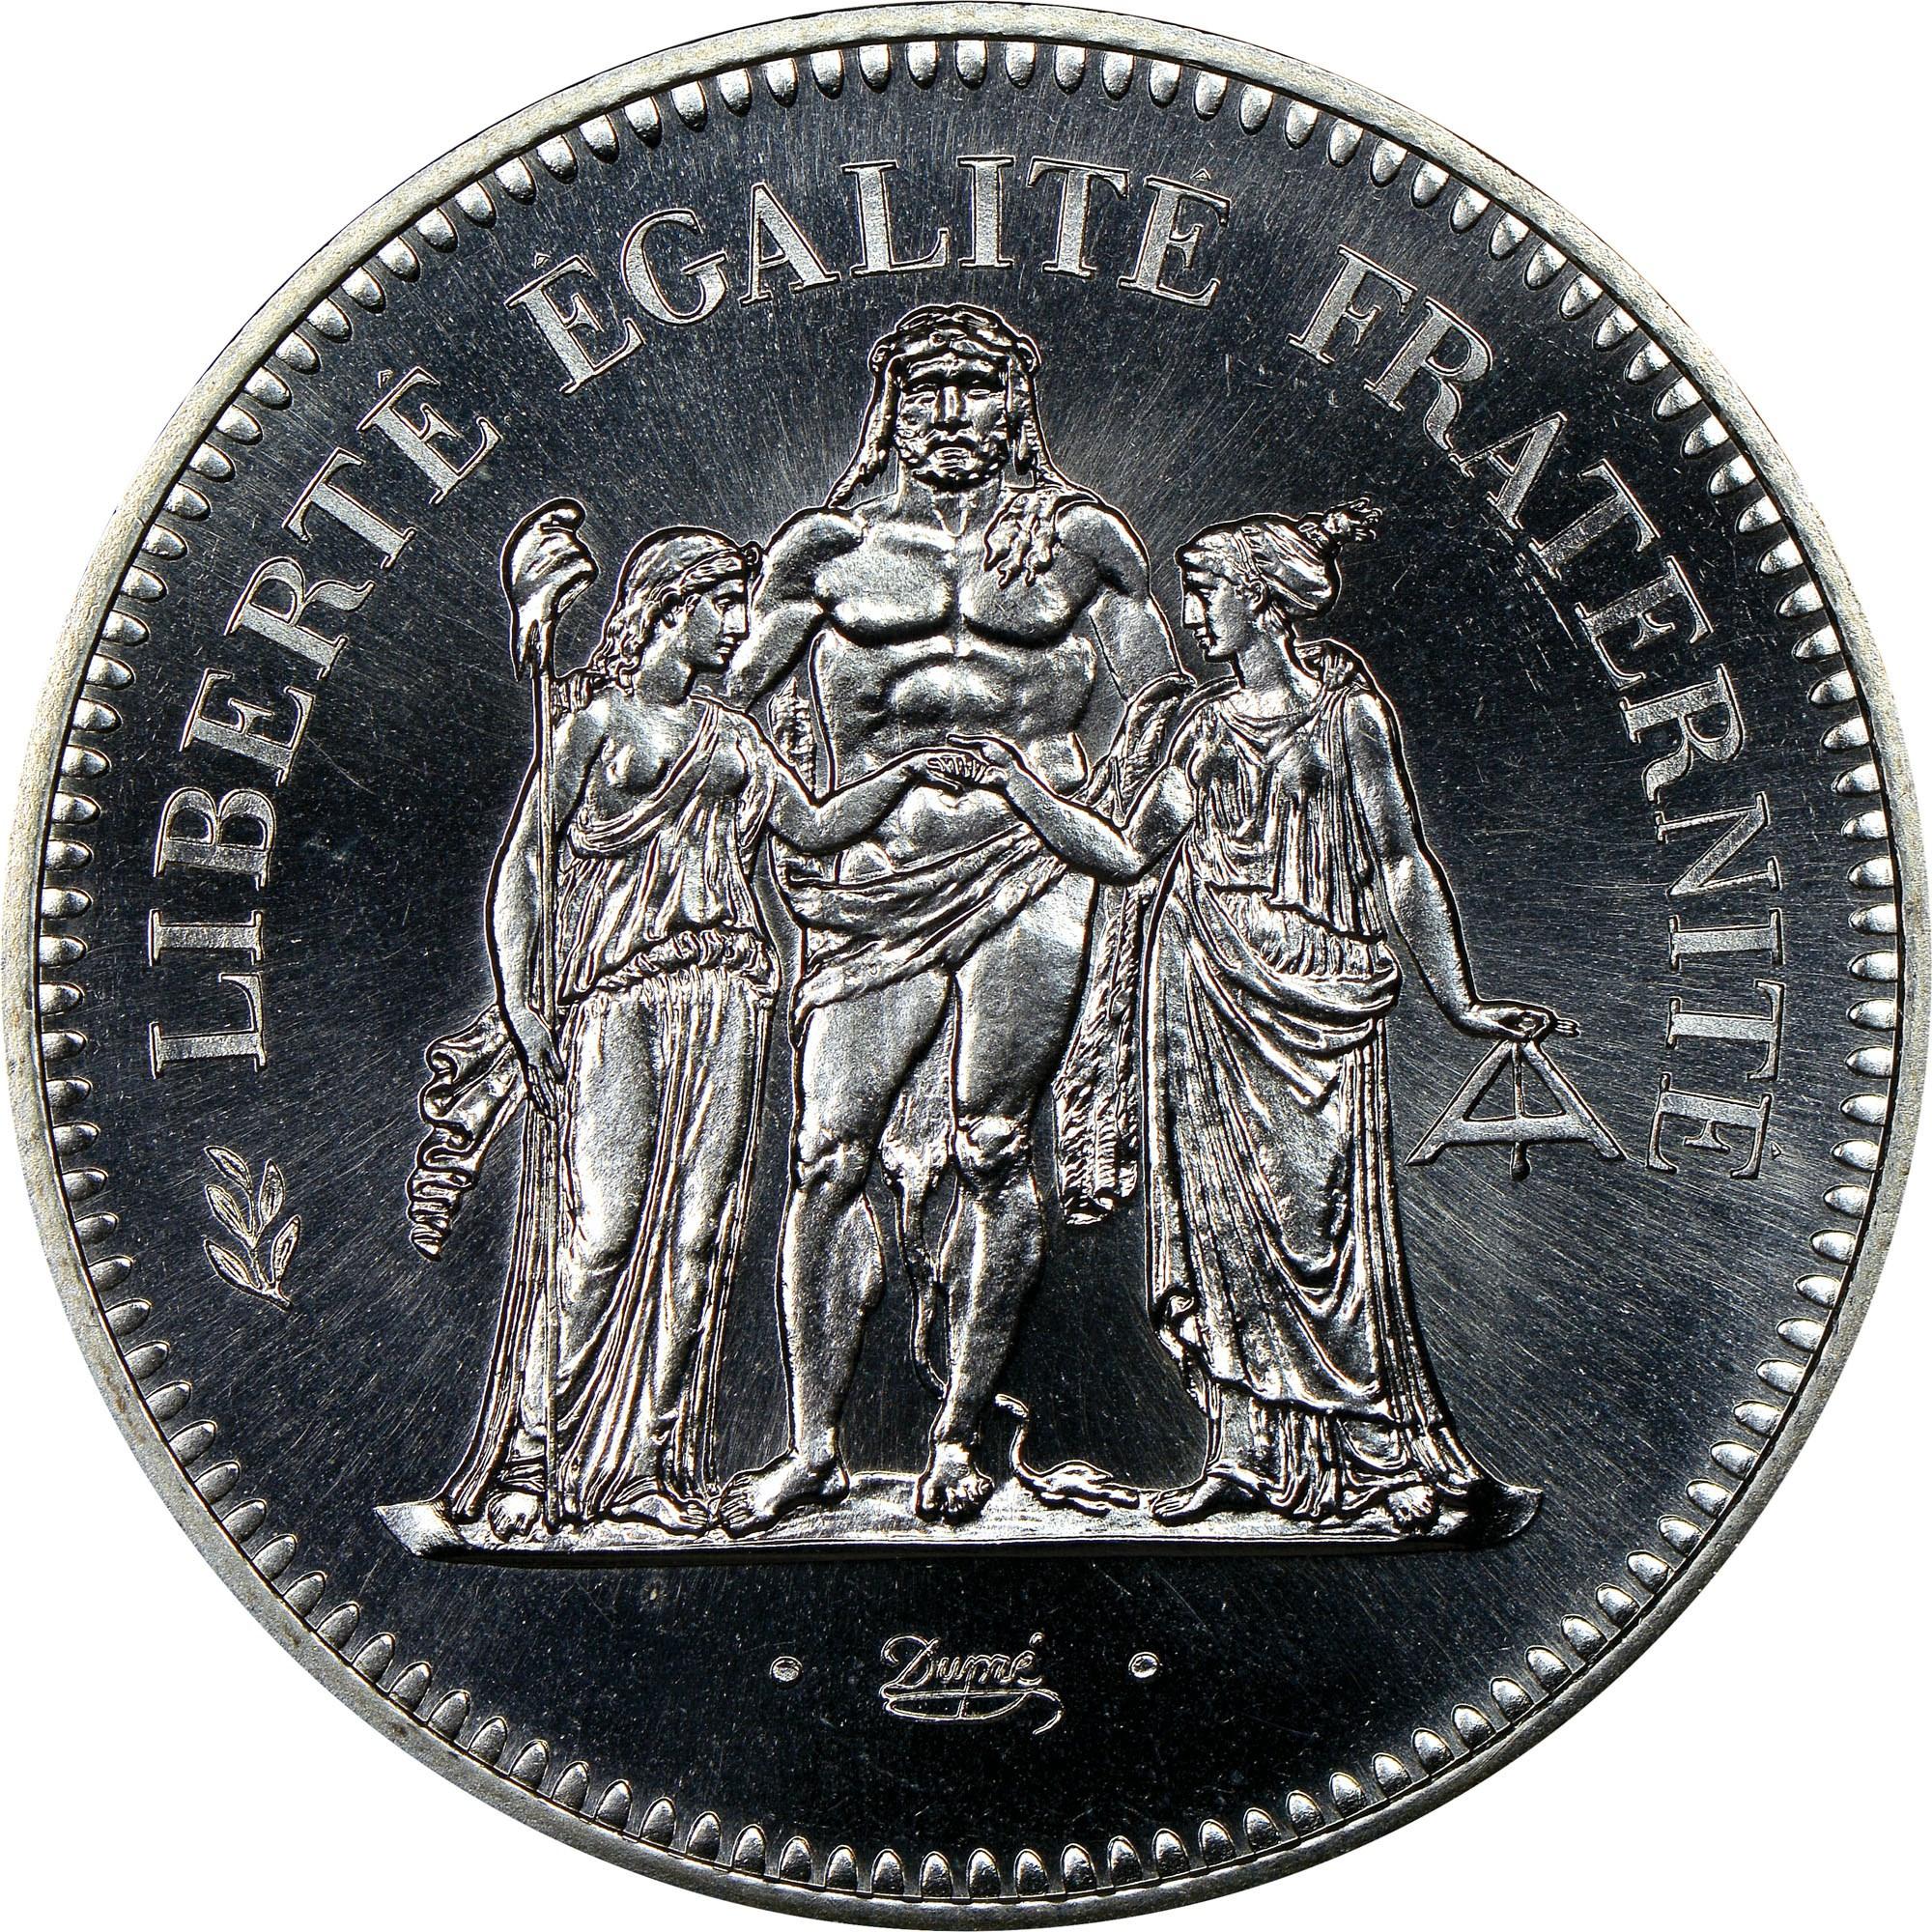 France 50 Francs reverse